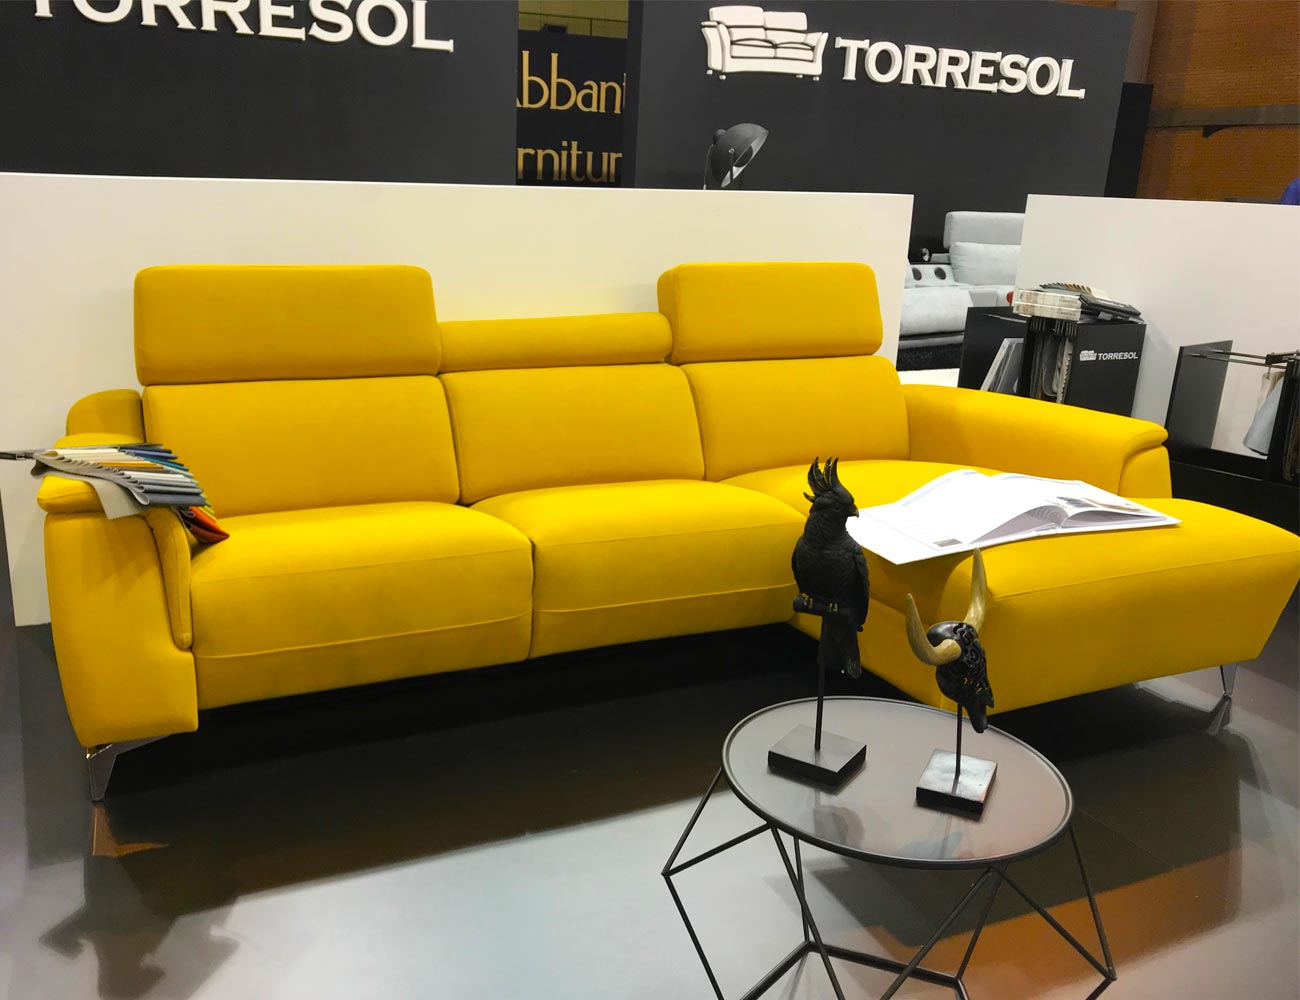 Sofa ralph torresol 1